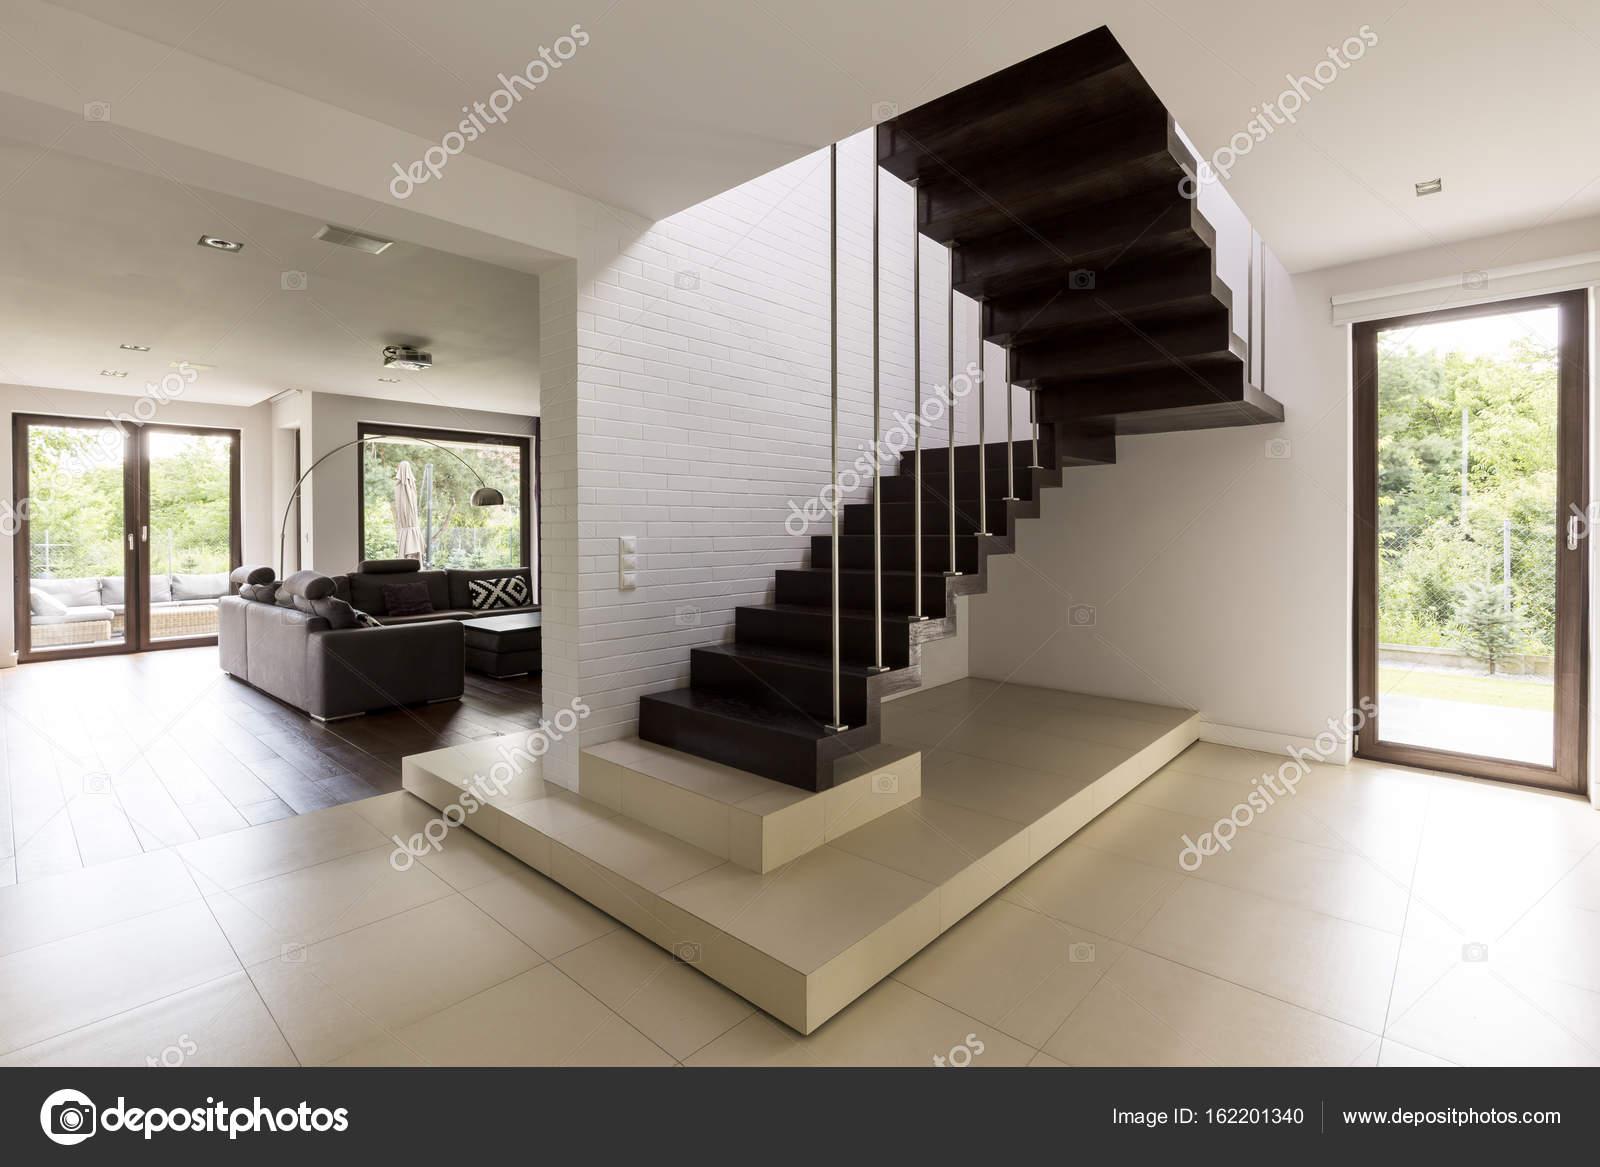 Treppe im Wohnzimmer — Stockfoto © photographee.eu #162201340